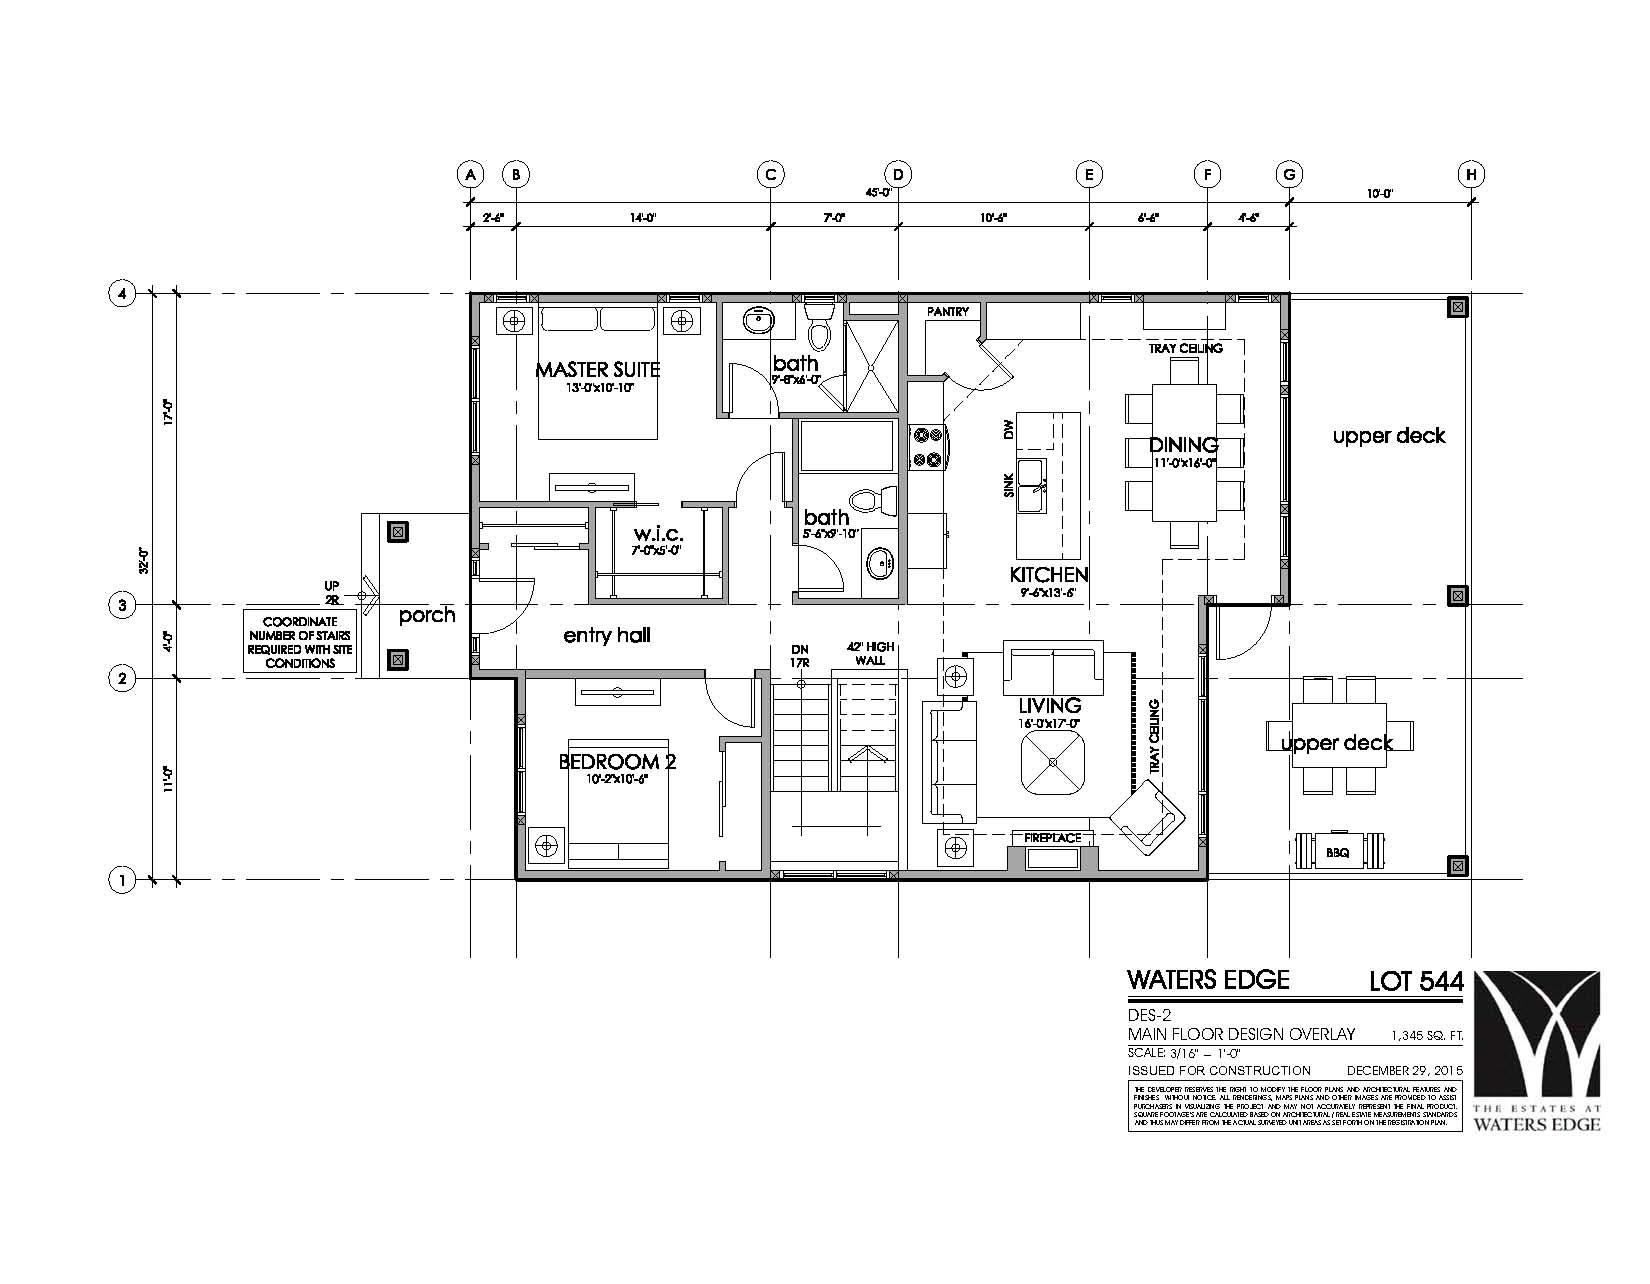 Waters Edge Lot 544-Main Floor